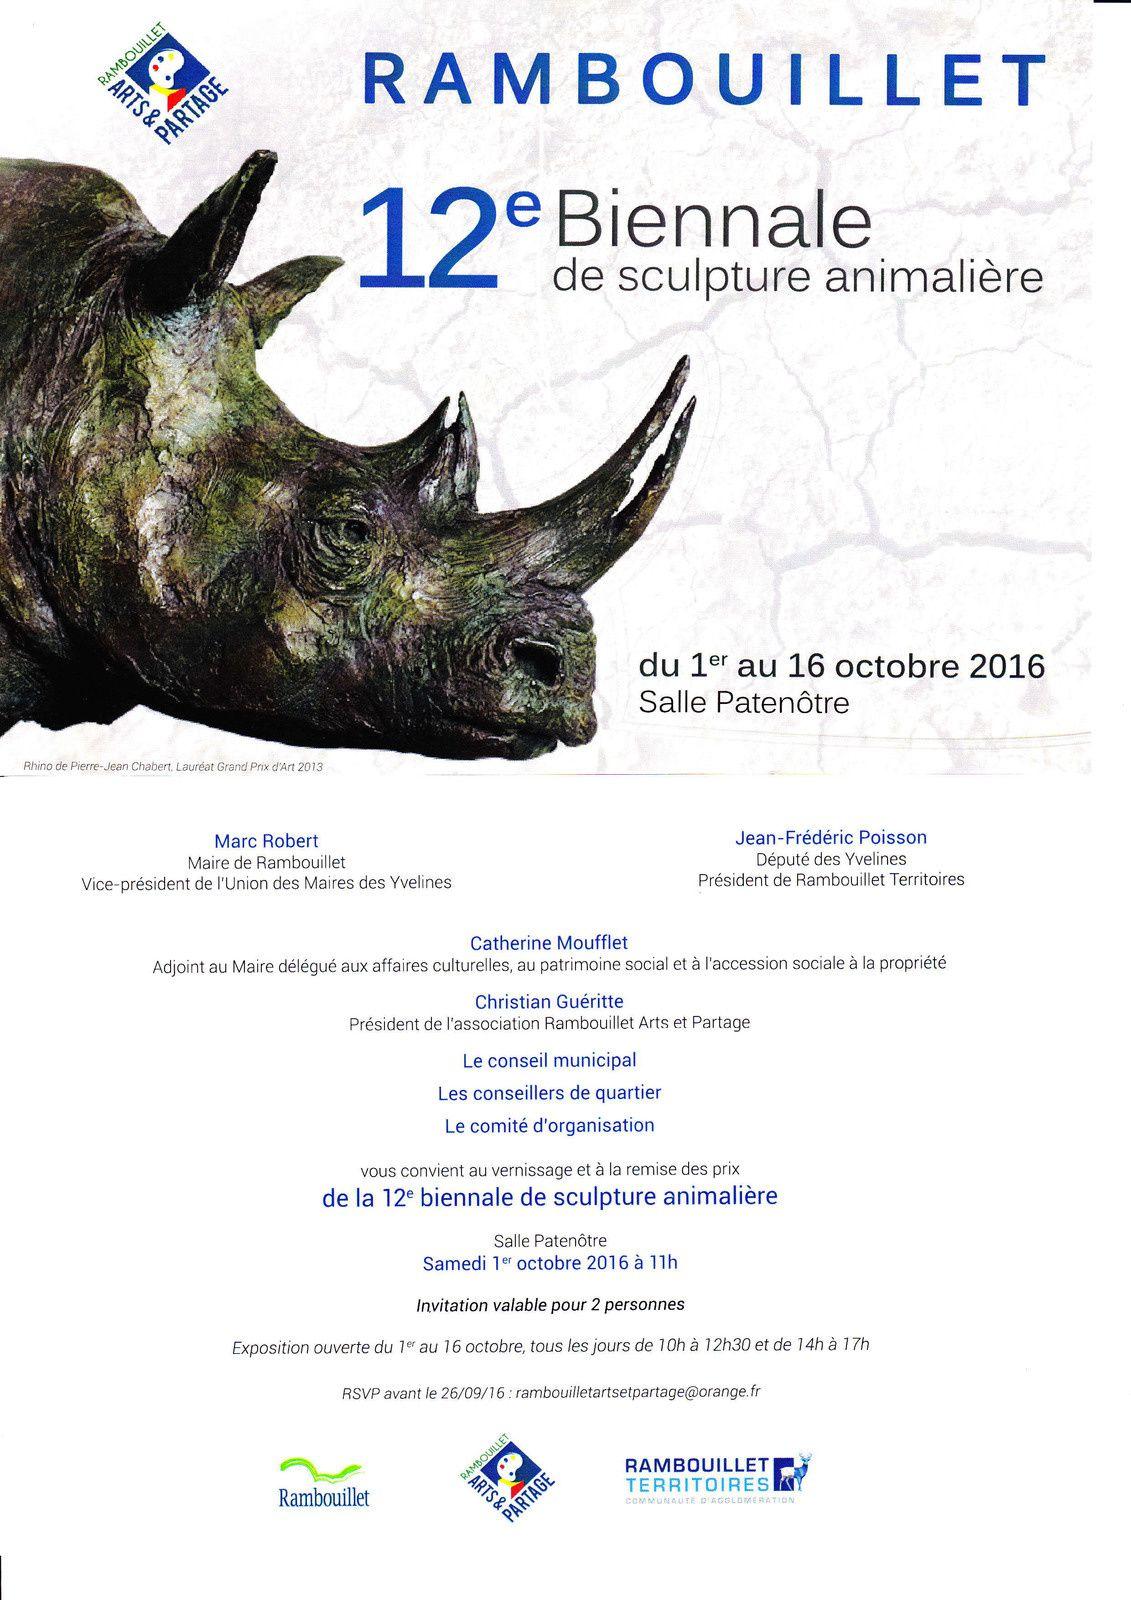 biennale de sculpture animalière de Rambouillet